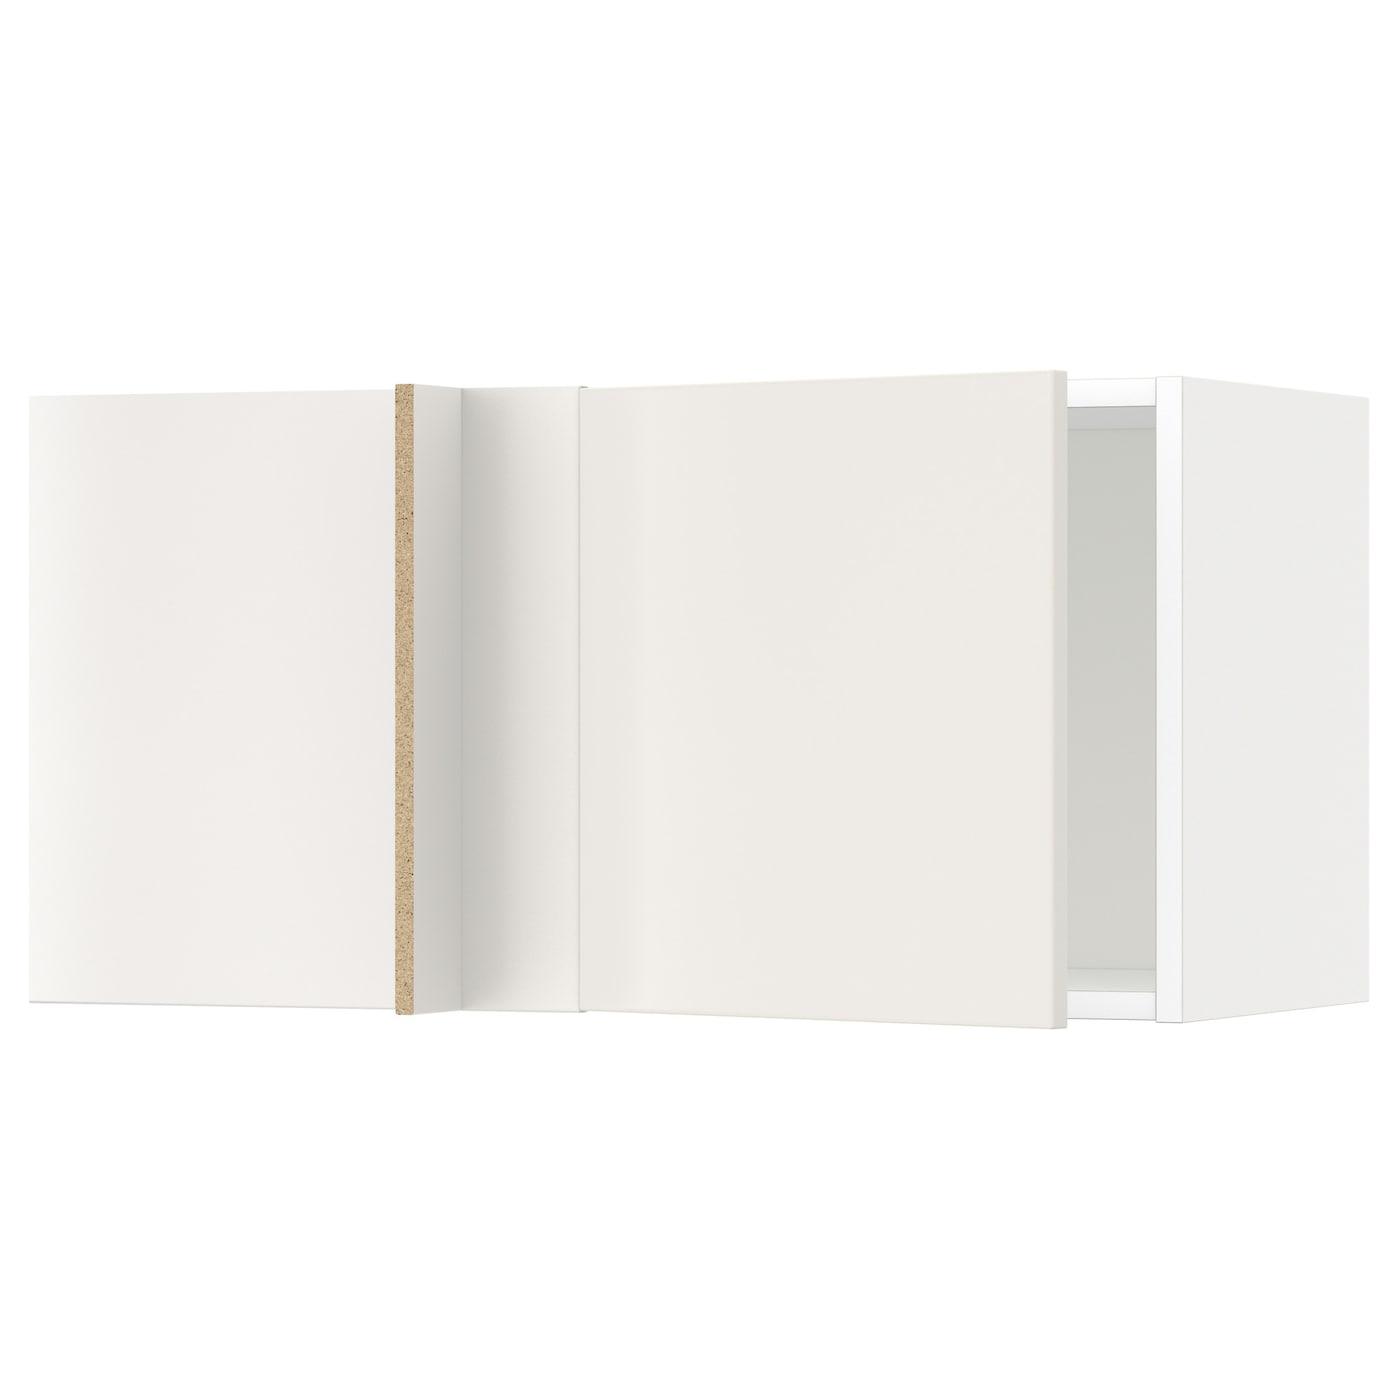 IKEA METOD Corner Wall Cabinet